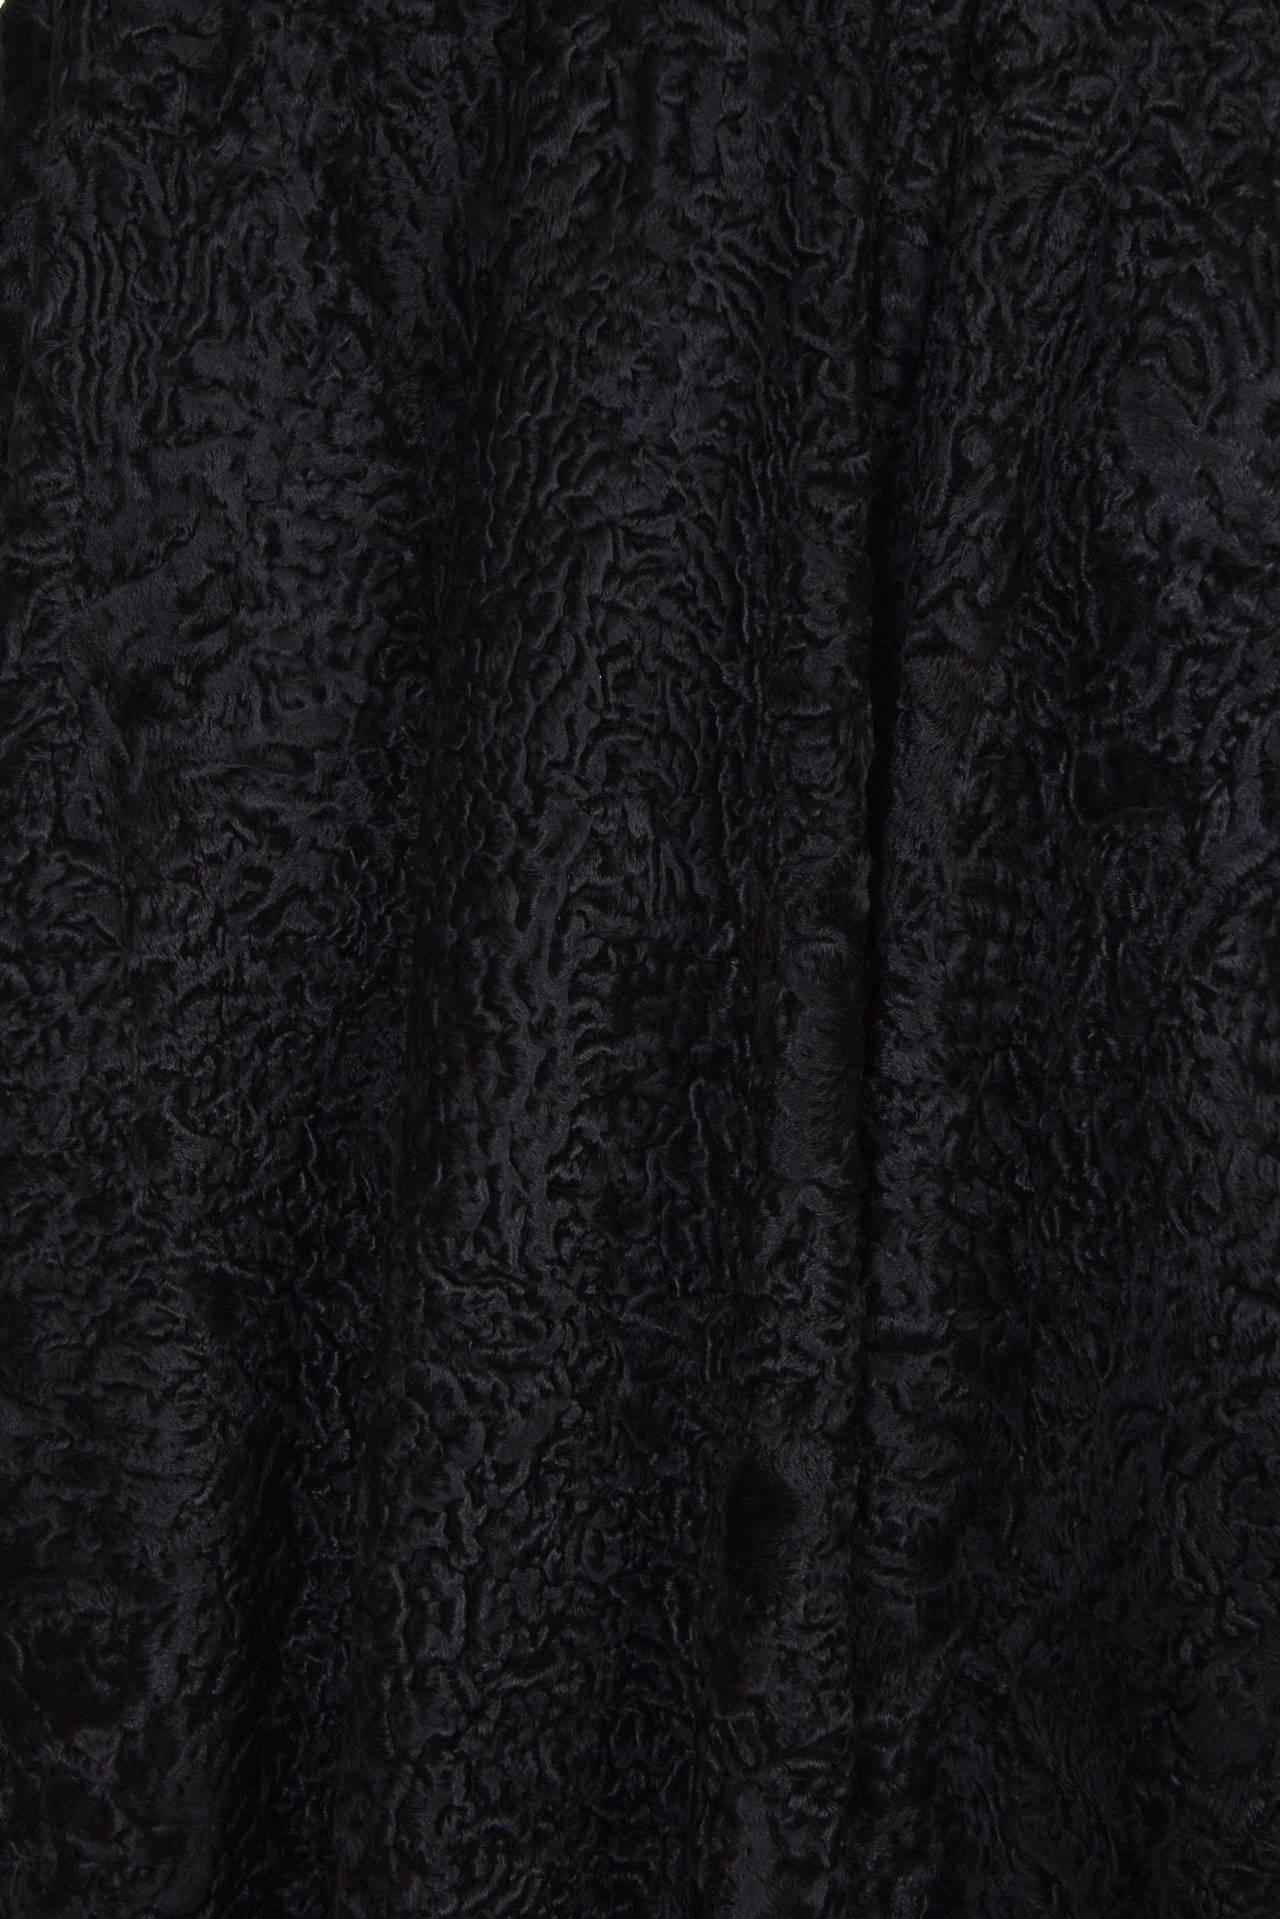 Patrick Kelly Asymetrical Minimalist Black Astrakhan Fur Coat 8